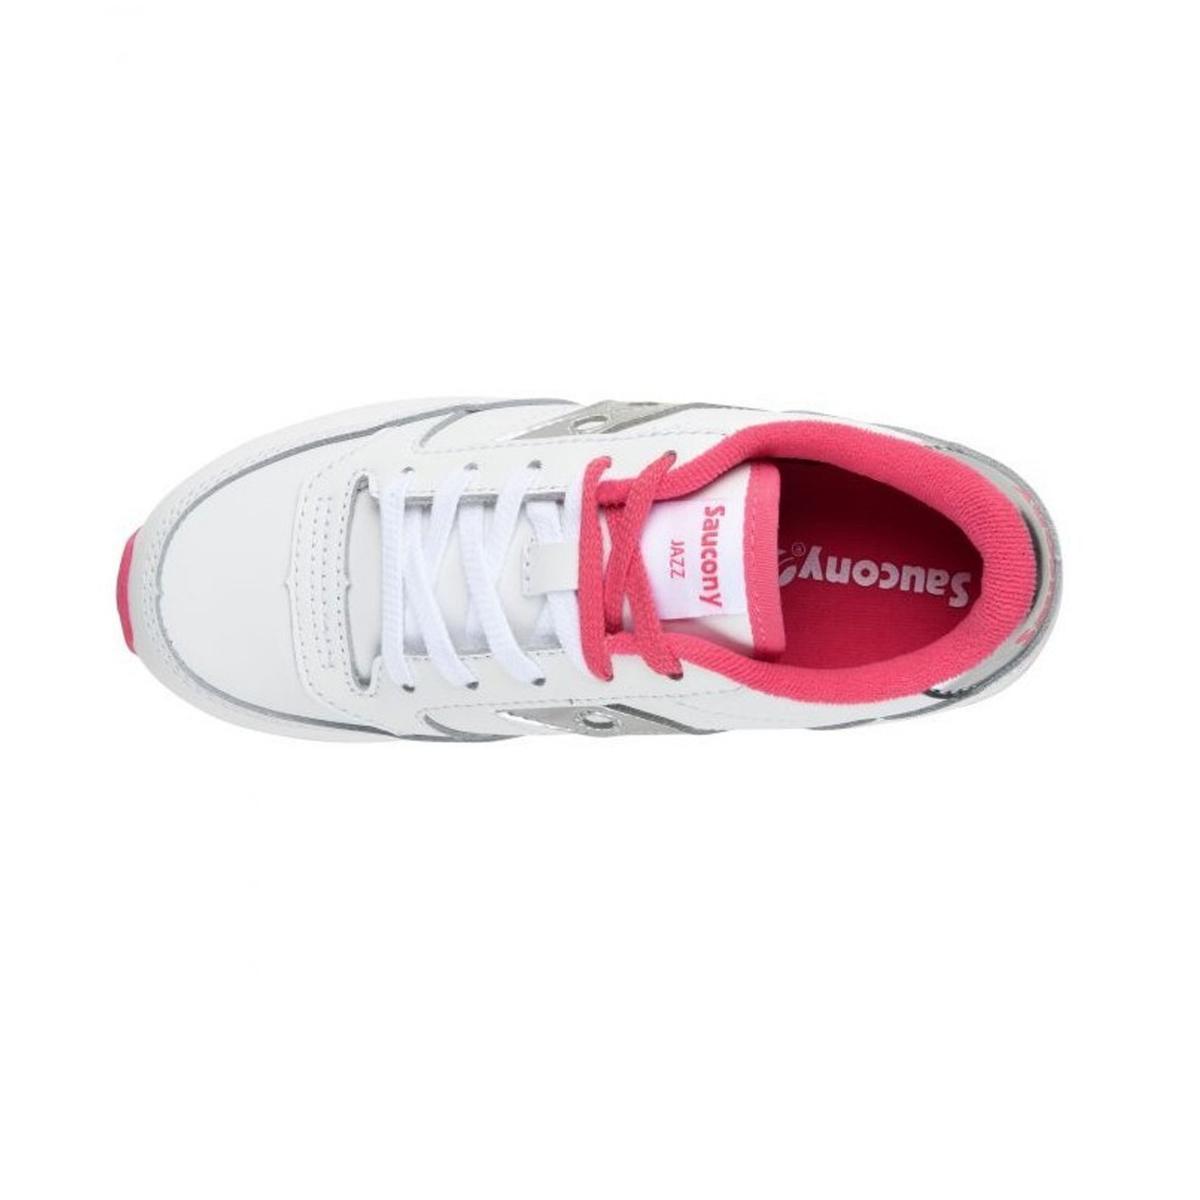 Scarpe Sneakers Saucony Jazz Original Girls da bambina rif. SK161260